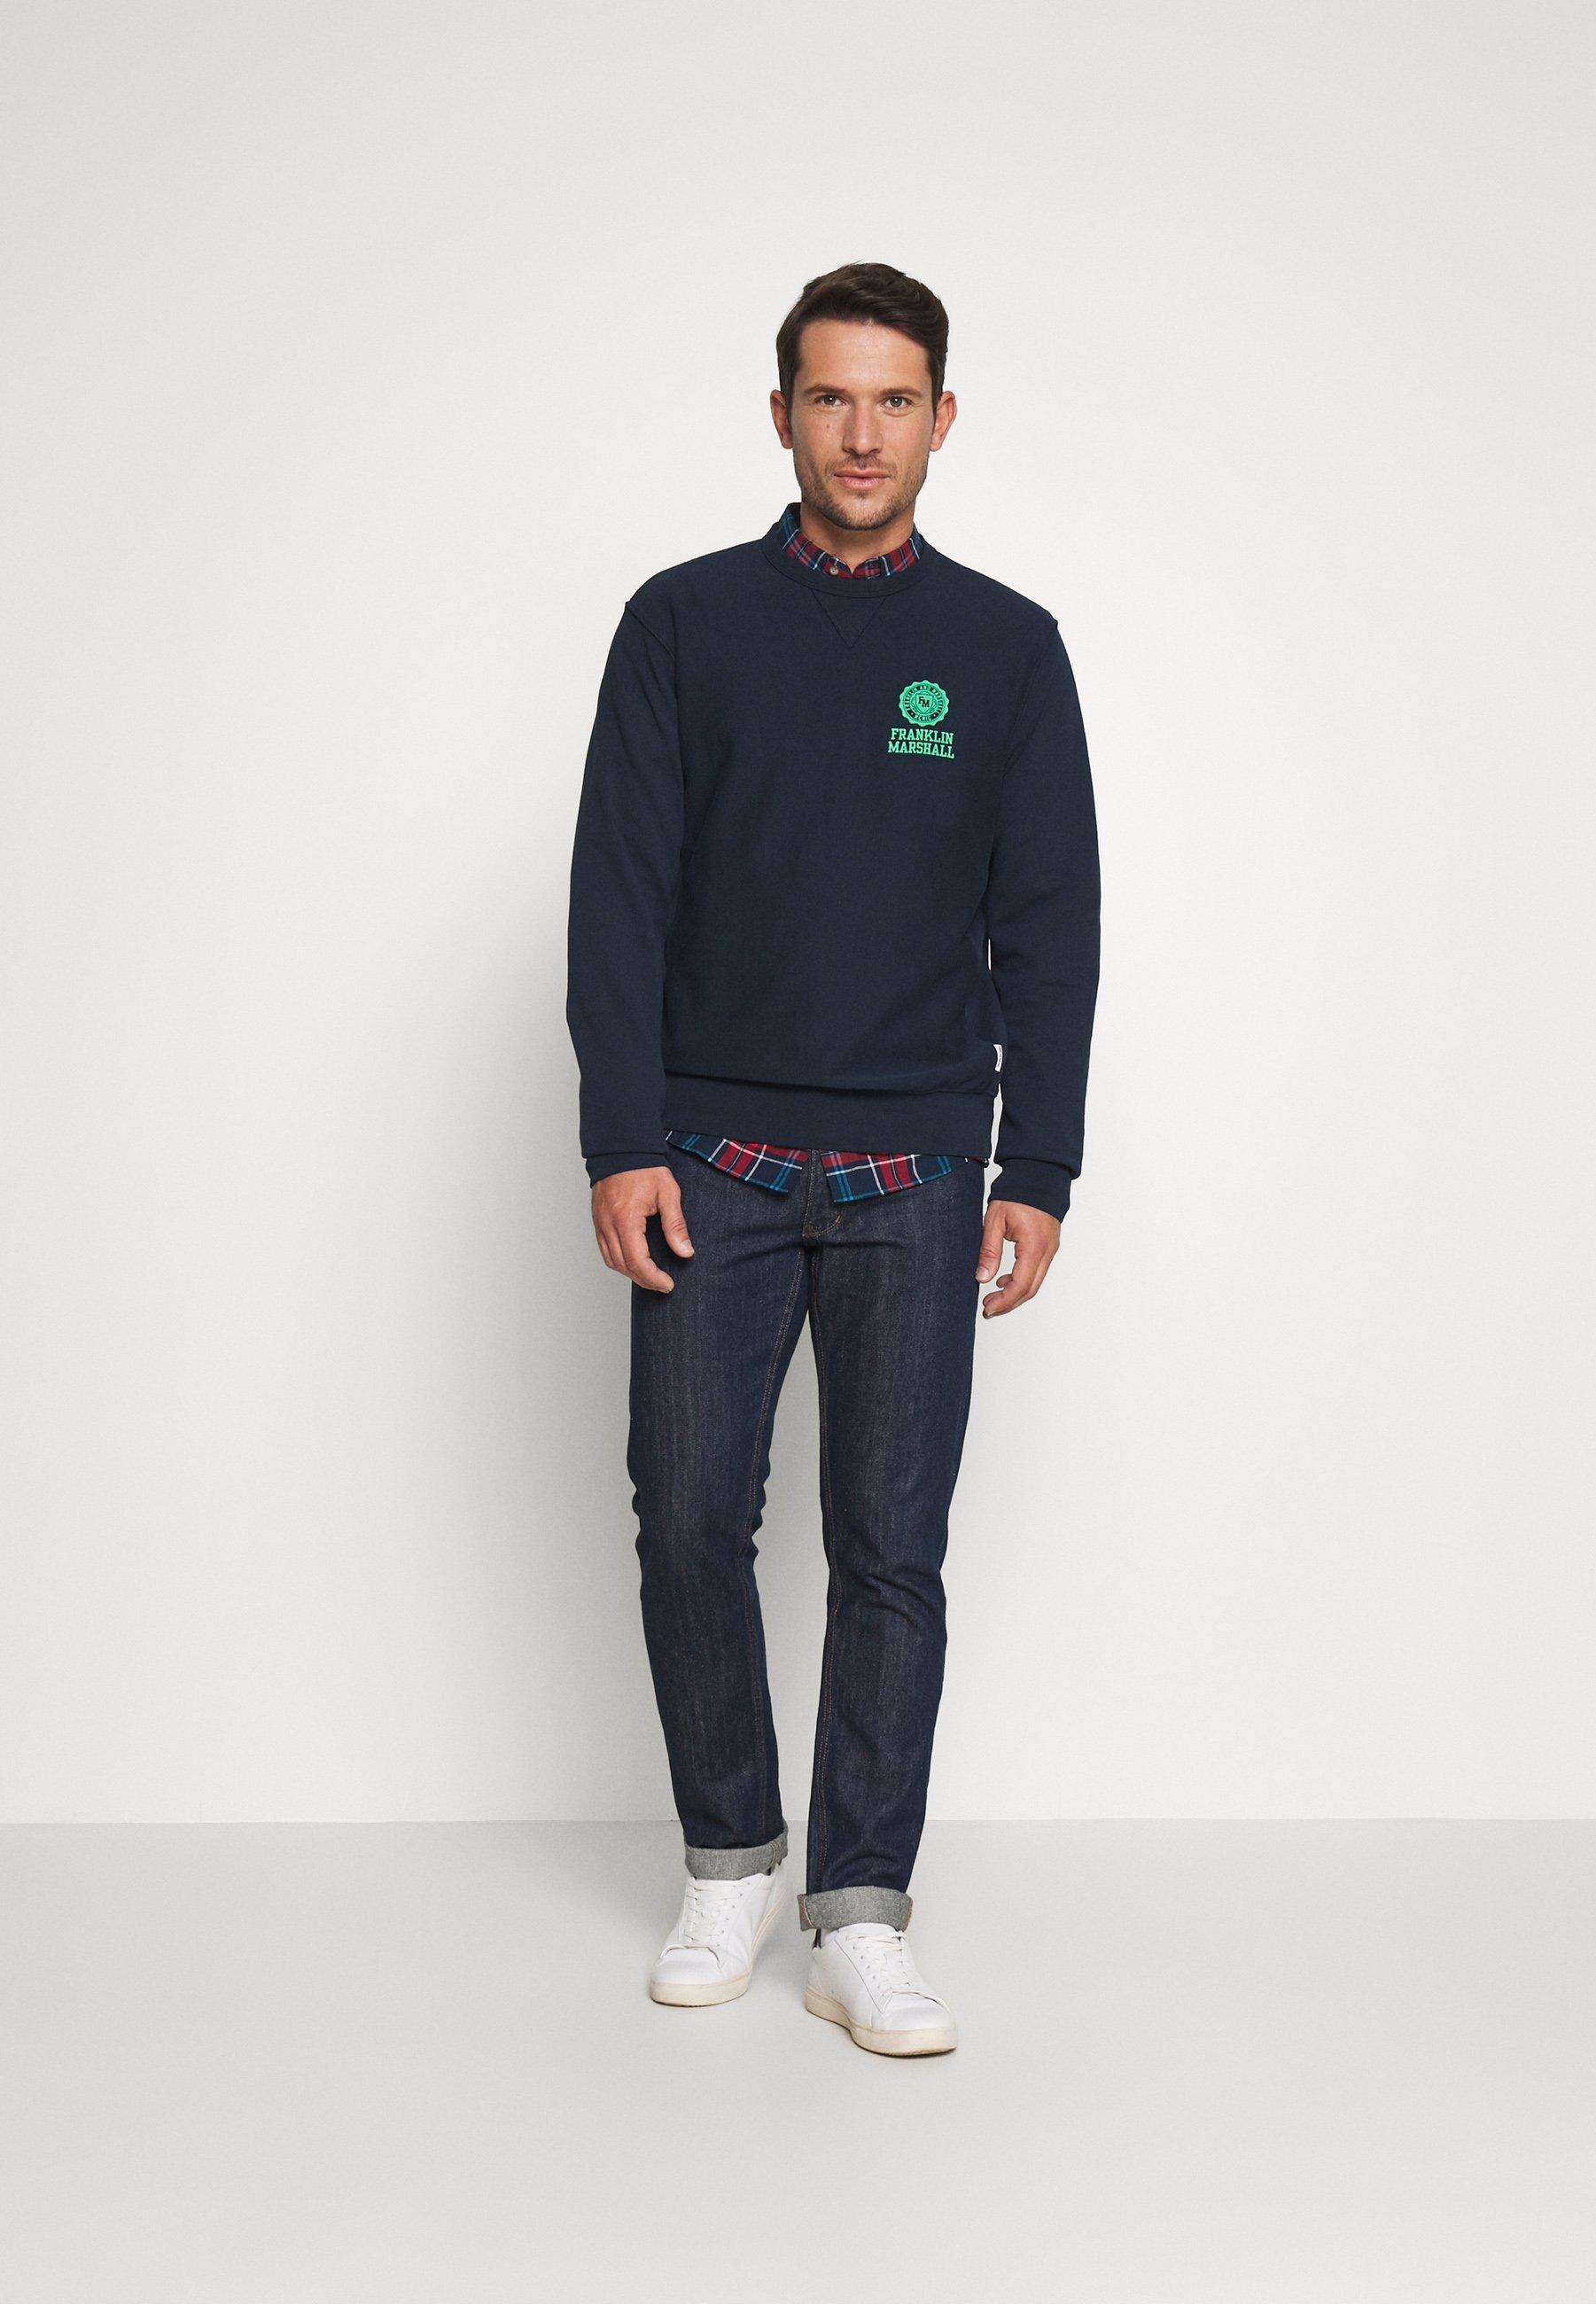 Franklin and Marshall Sweatshirt | Austria